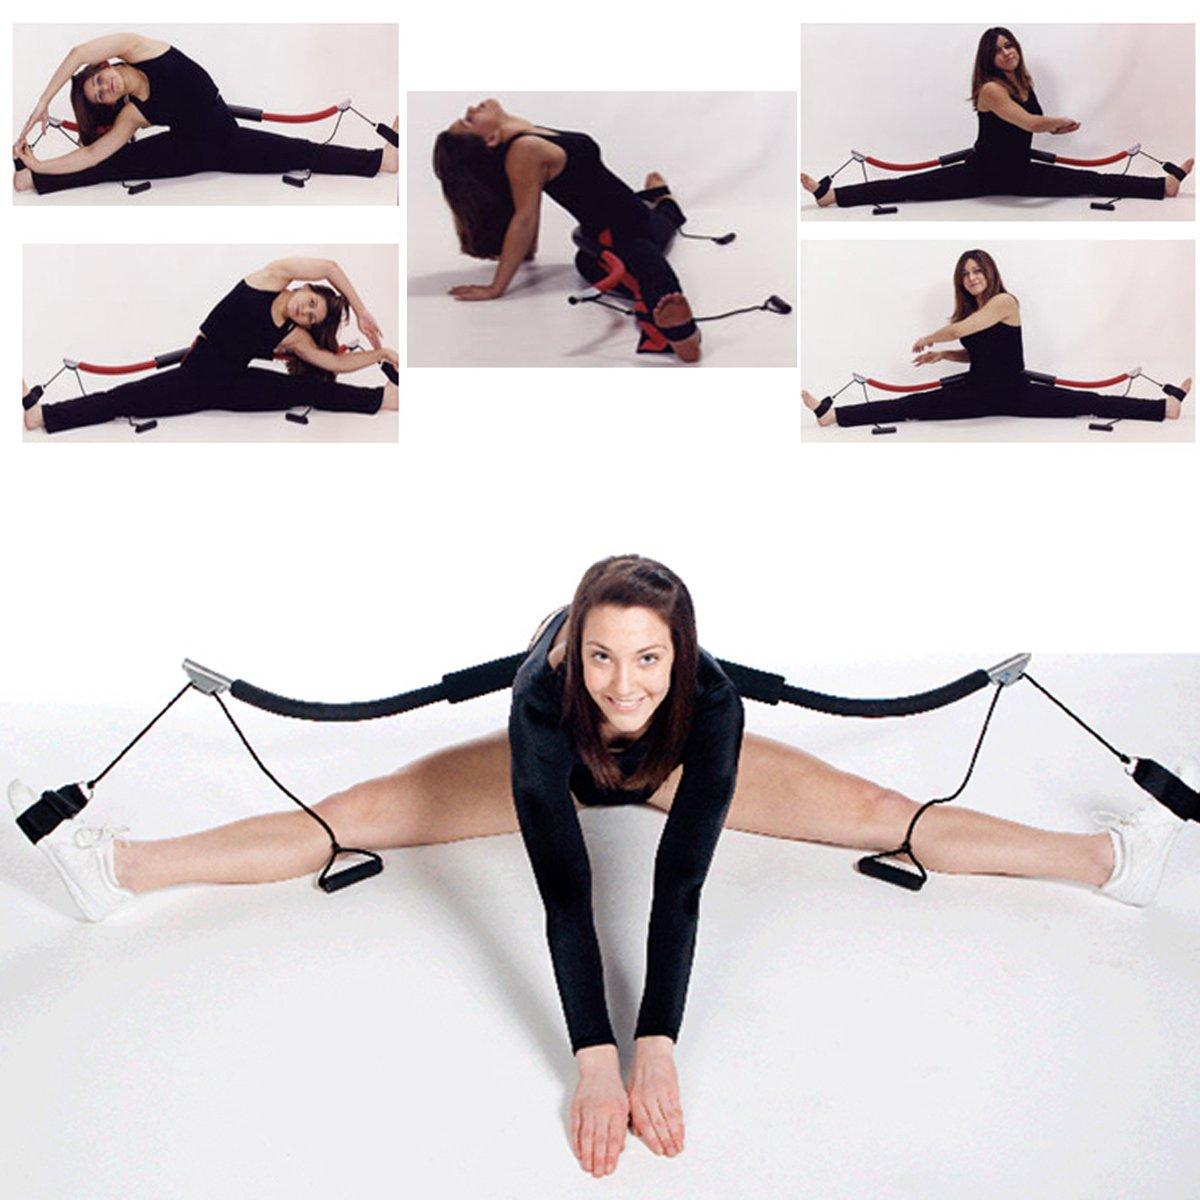 Amazon.com: Mervie - Acelerador de piernas plegable, máquina ...